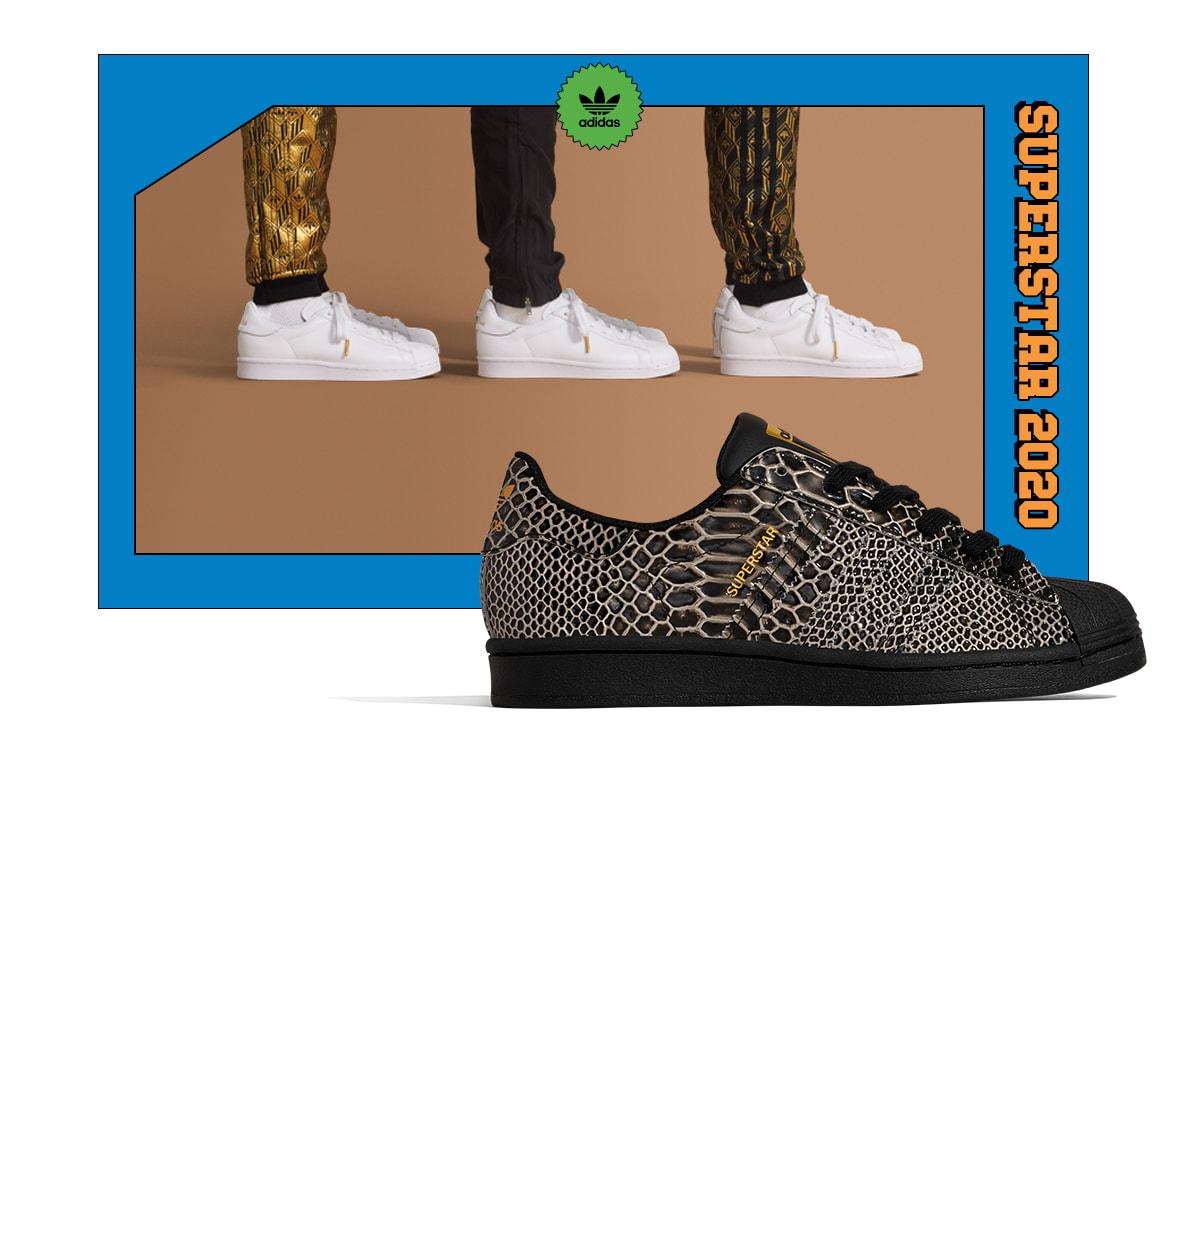 Sole Avenue PH Special Release In Stock Adidas Iniki